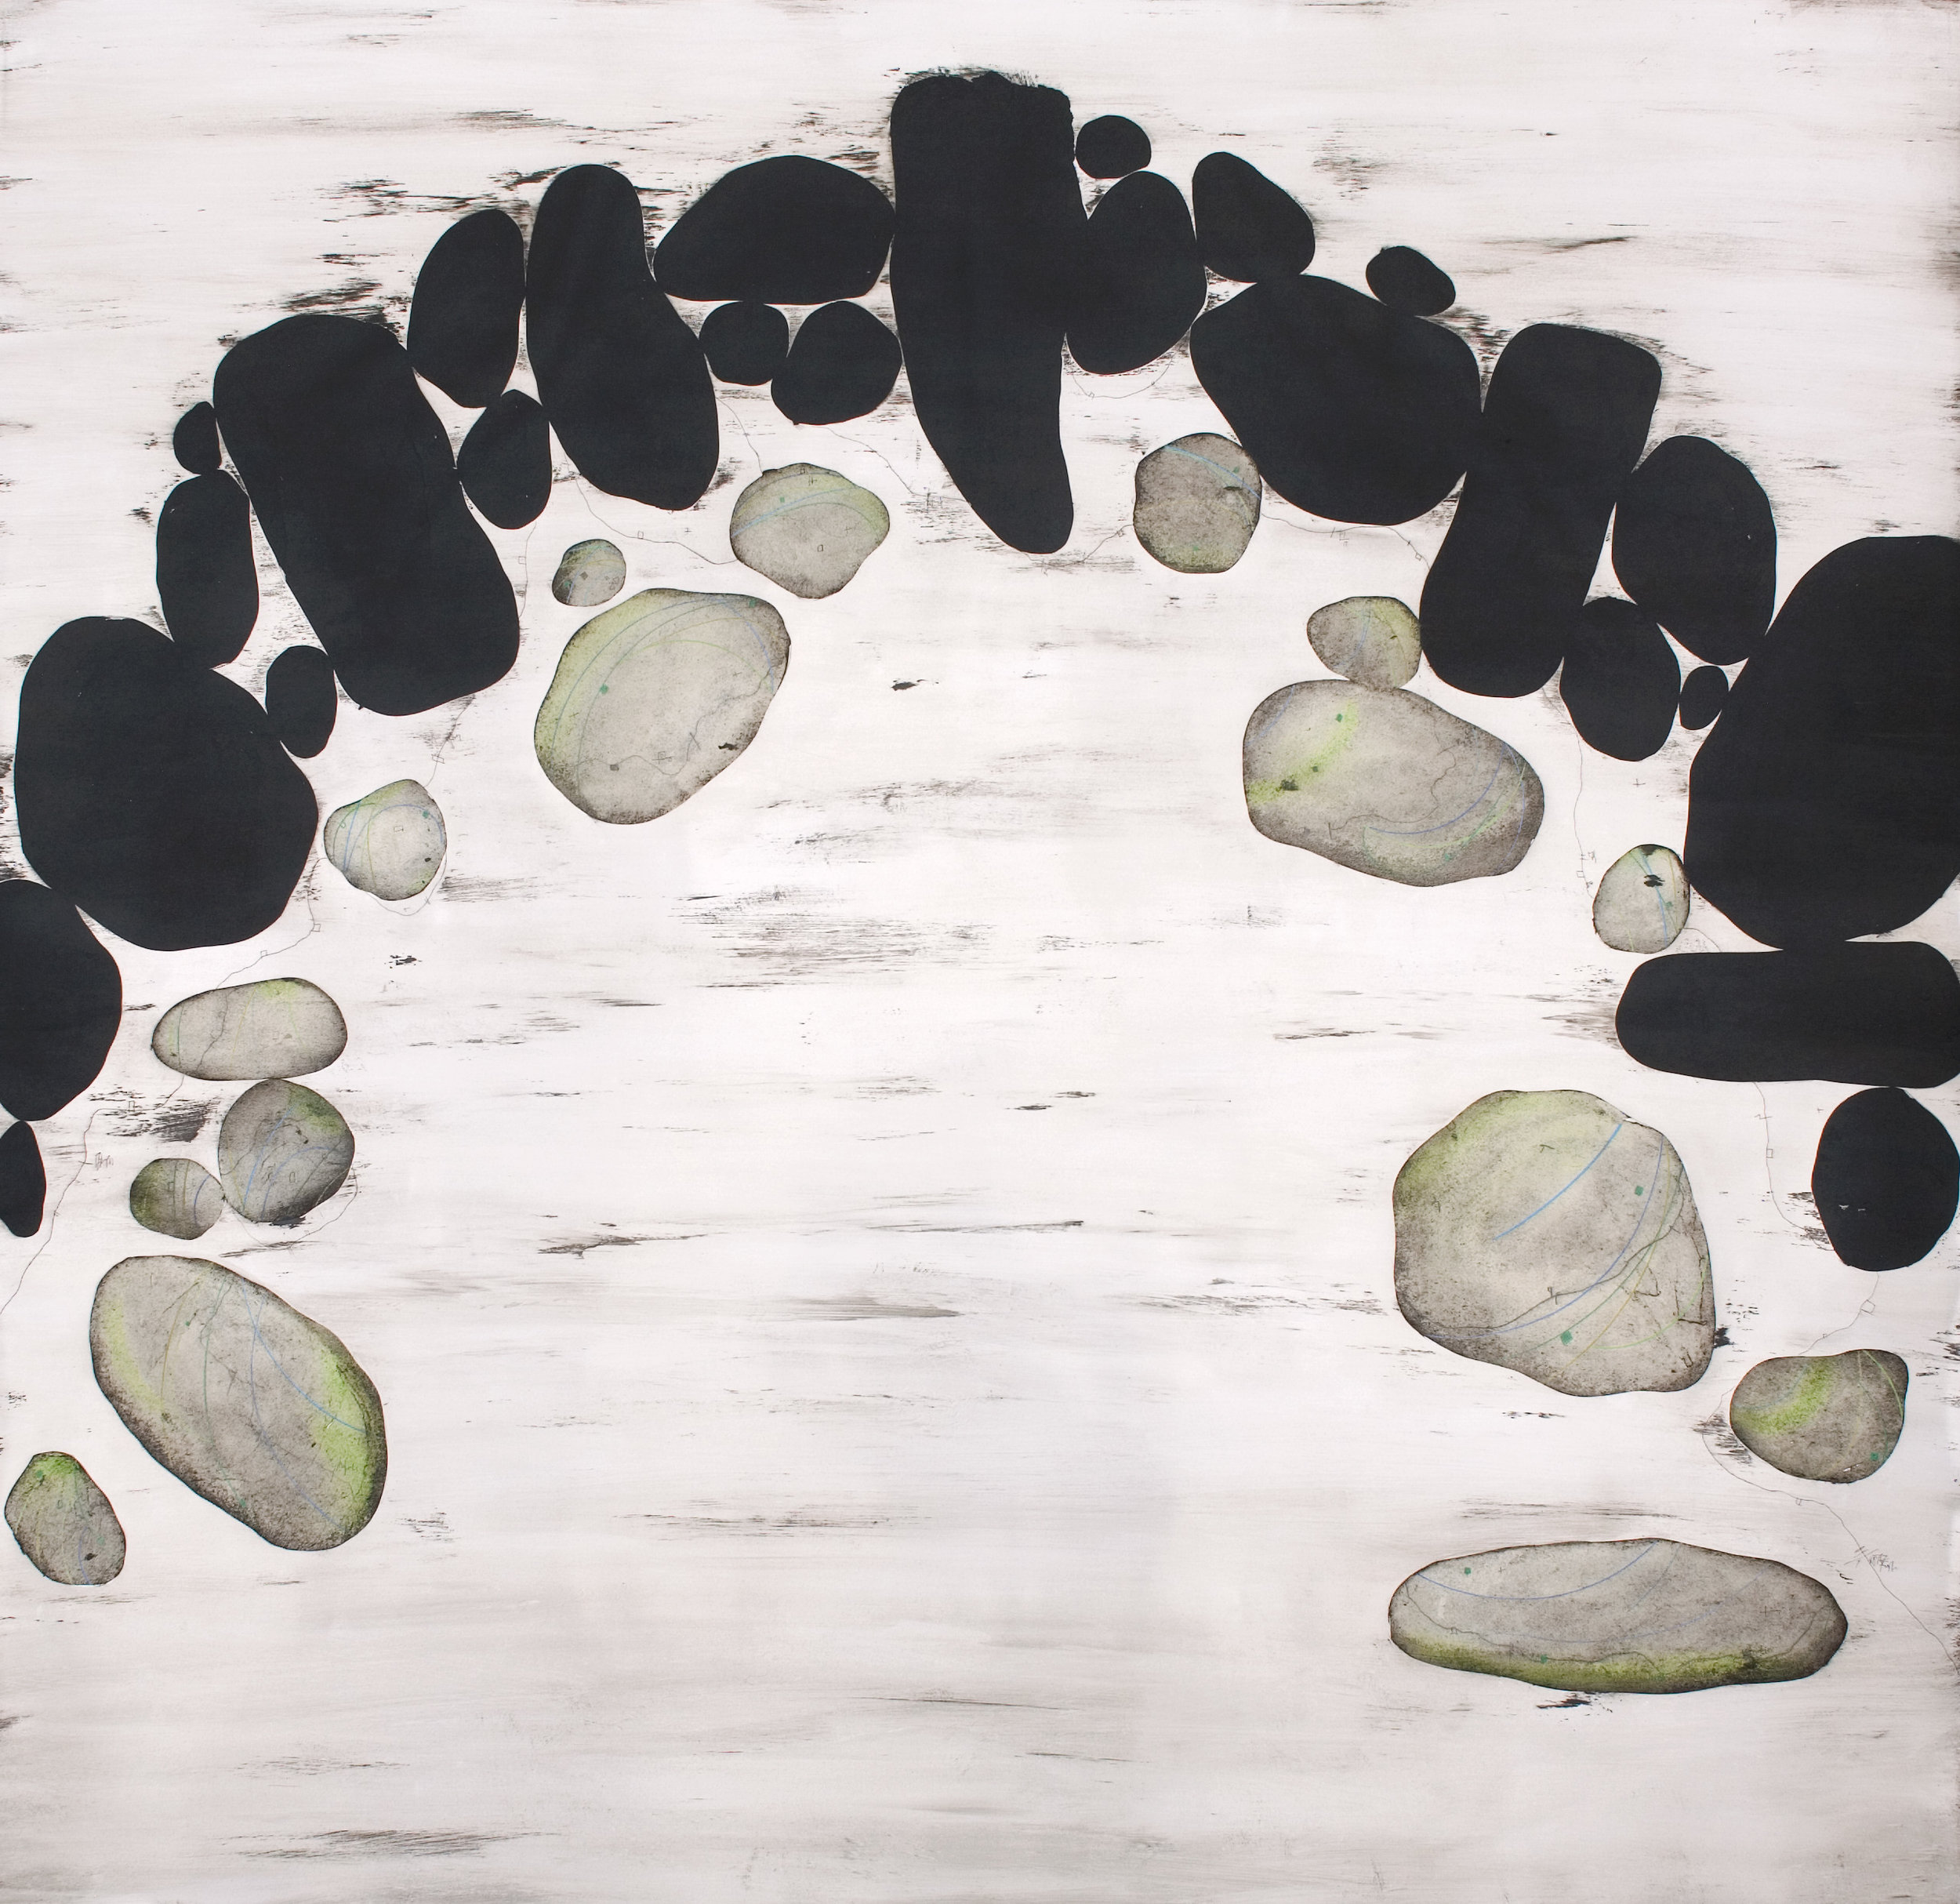 """The soul of stones nº 4"" . enamel and crayons on paper - 150 x150 cm - Manu vb tintoré"